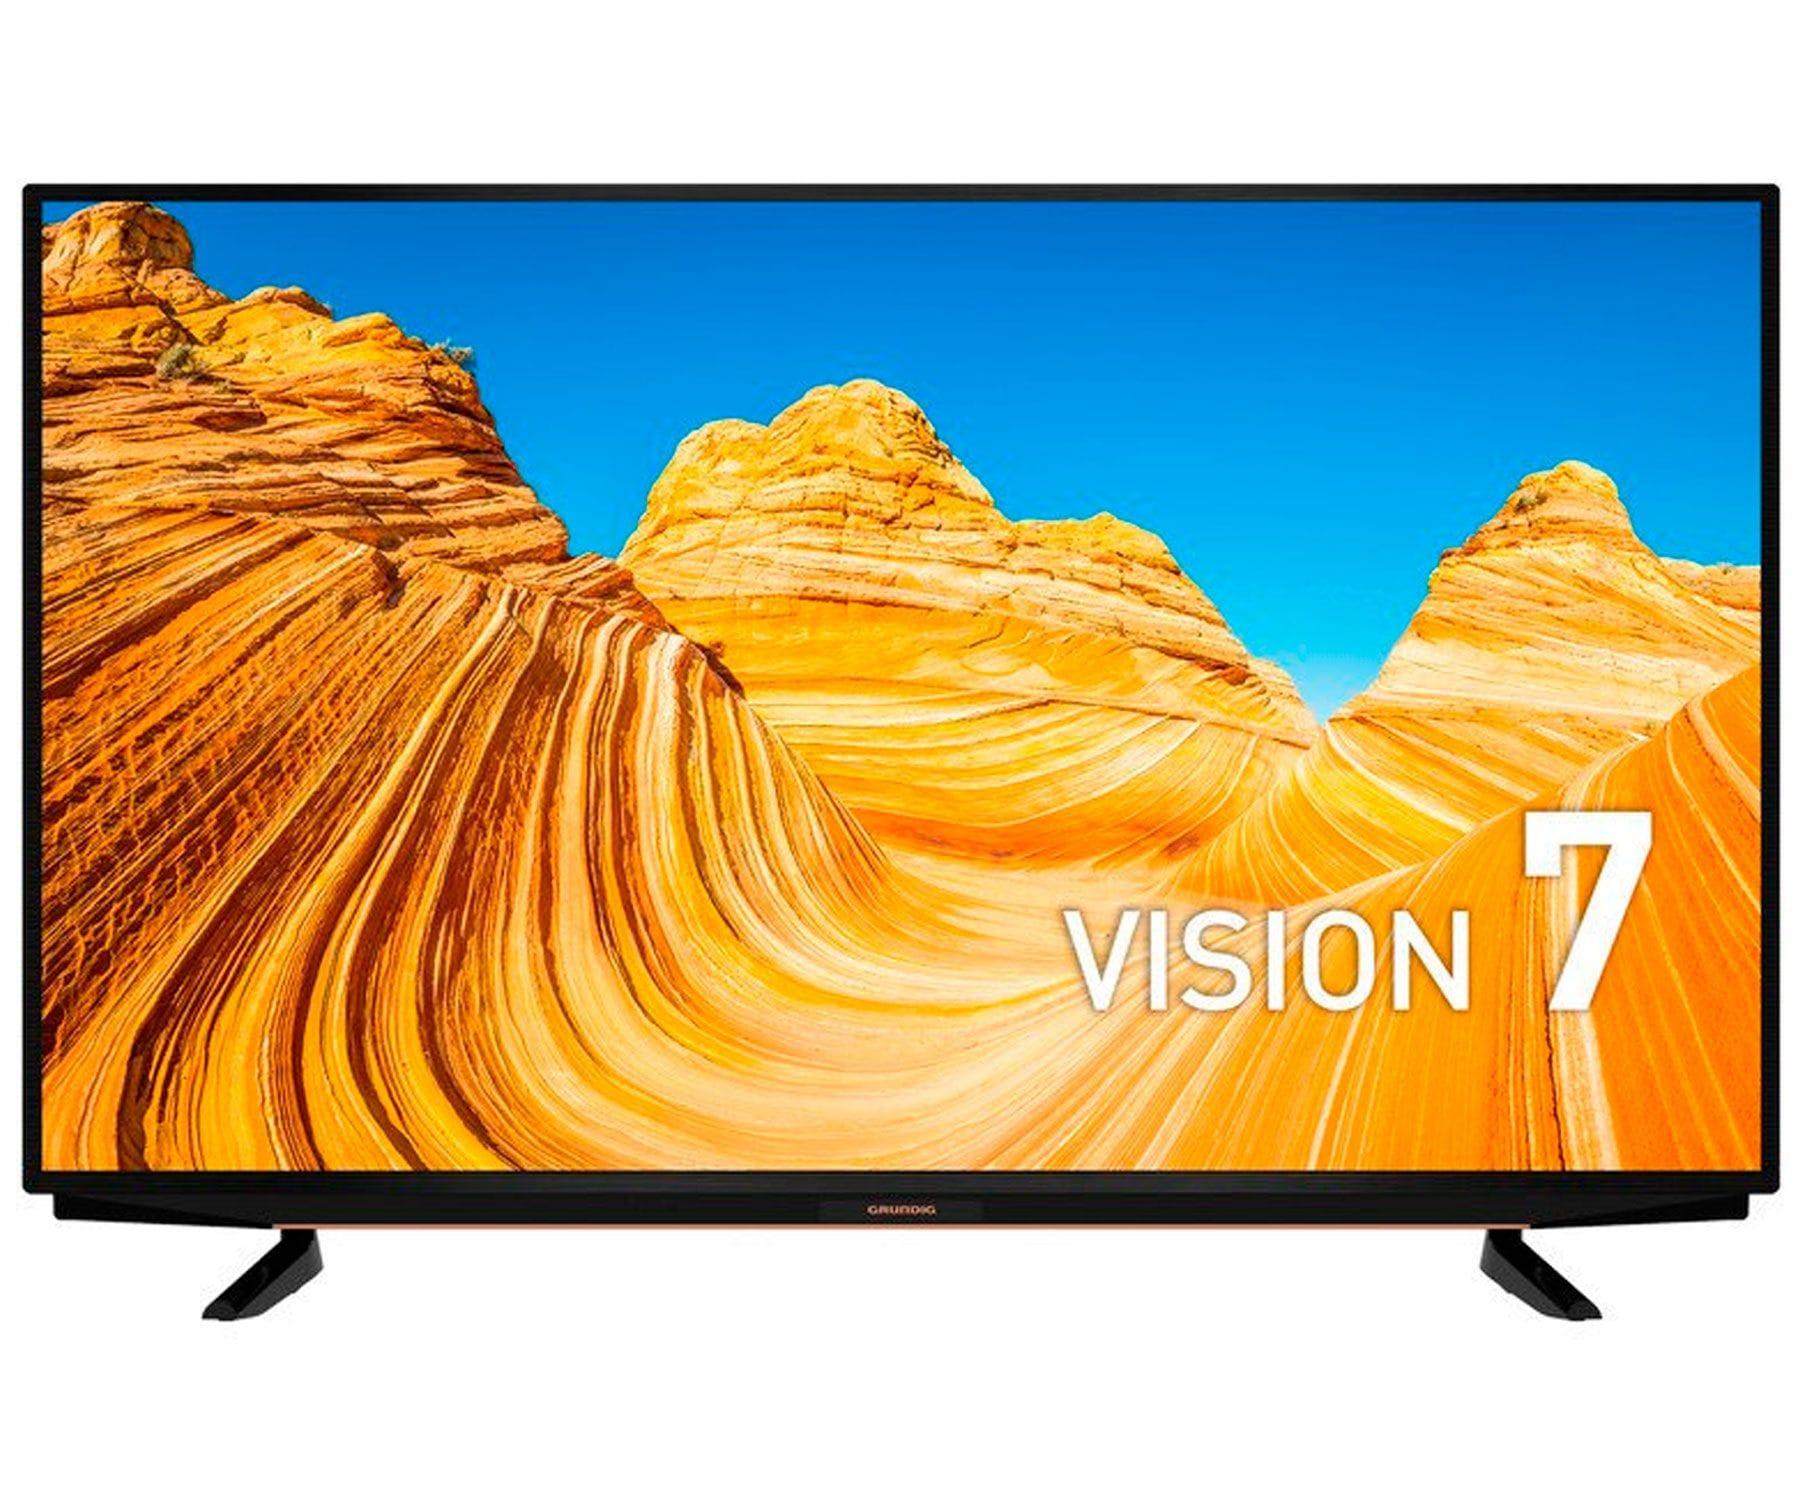 GRUNDIG 55GEU7990C TELEVISOR SMART TV 55'' UHD 4K HDR